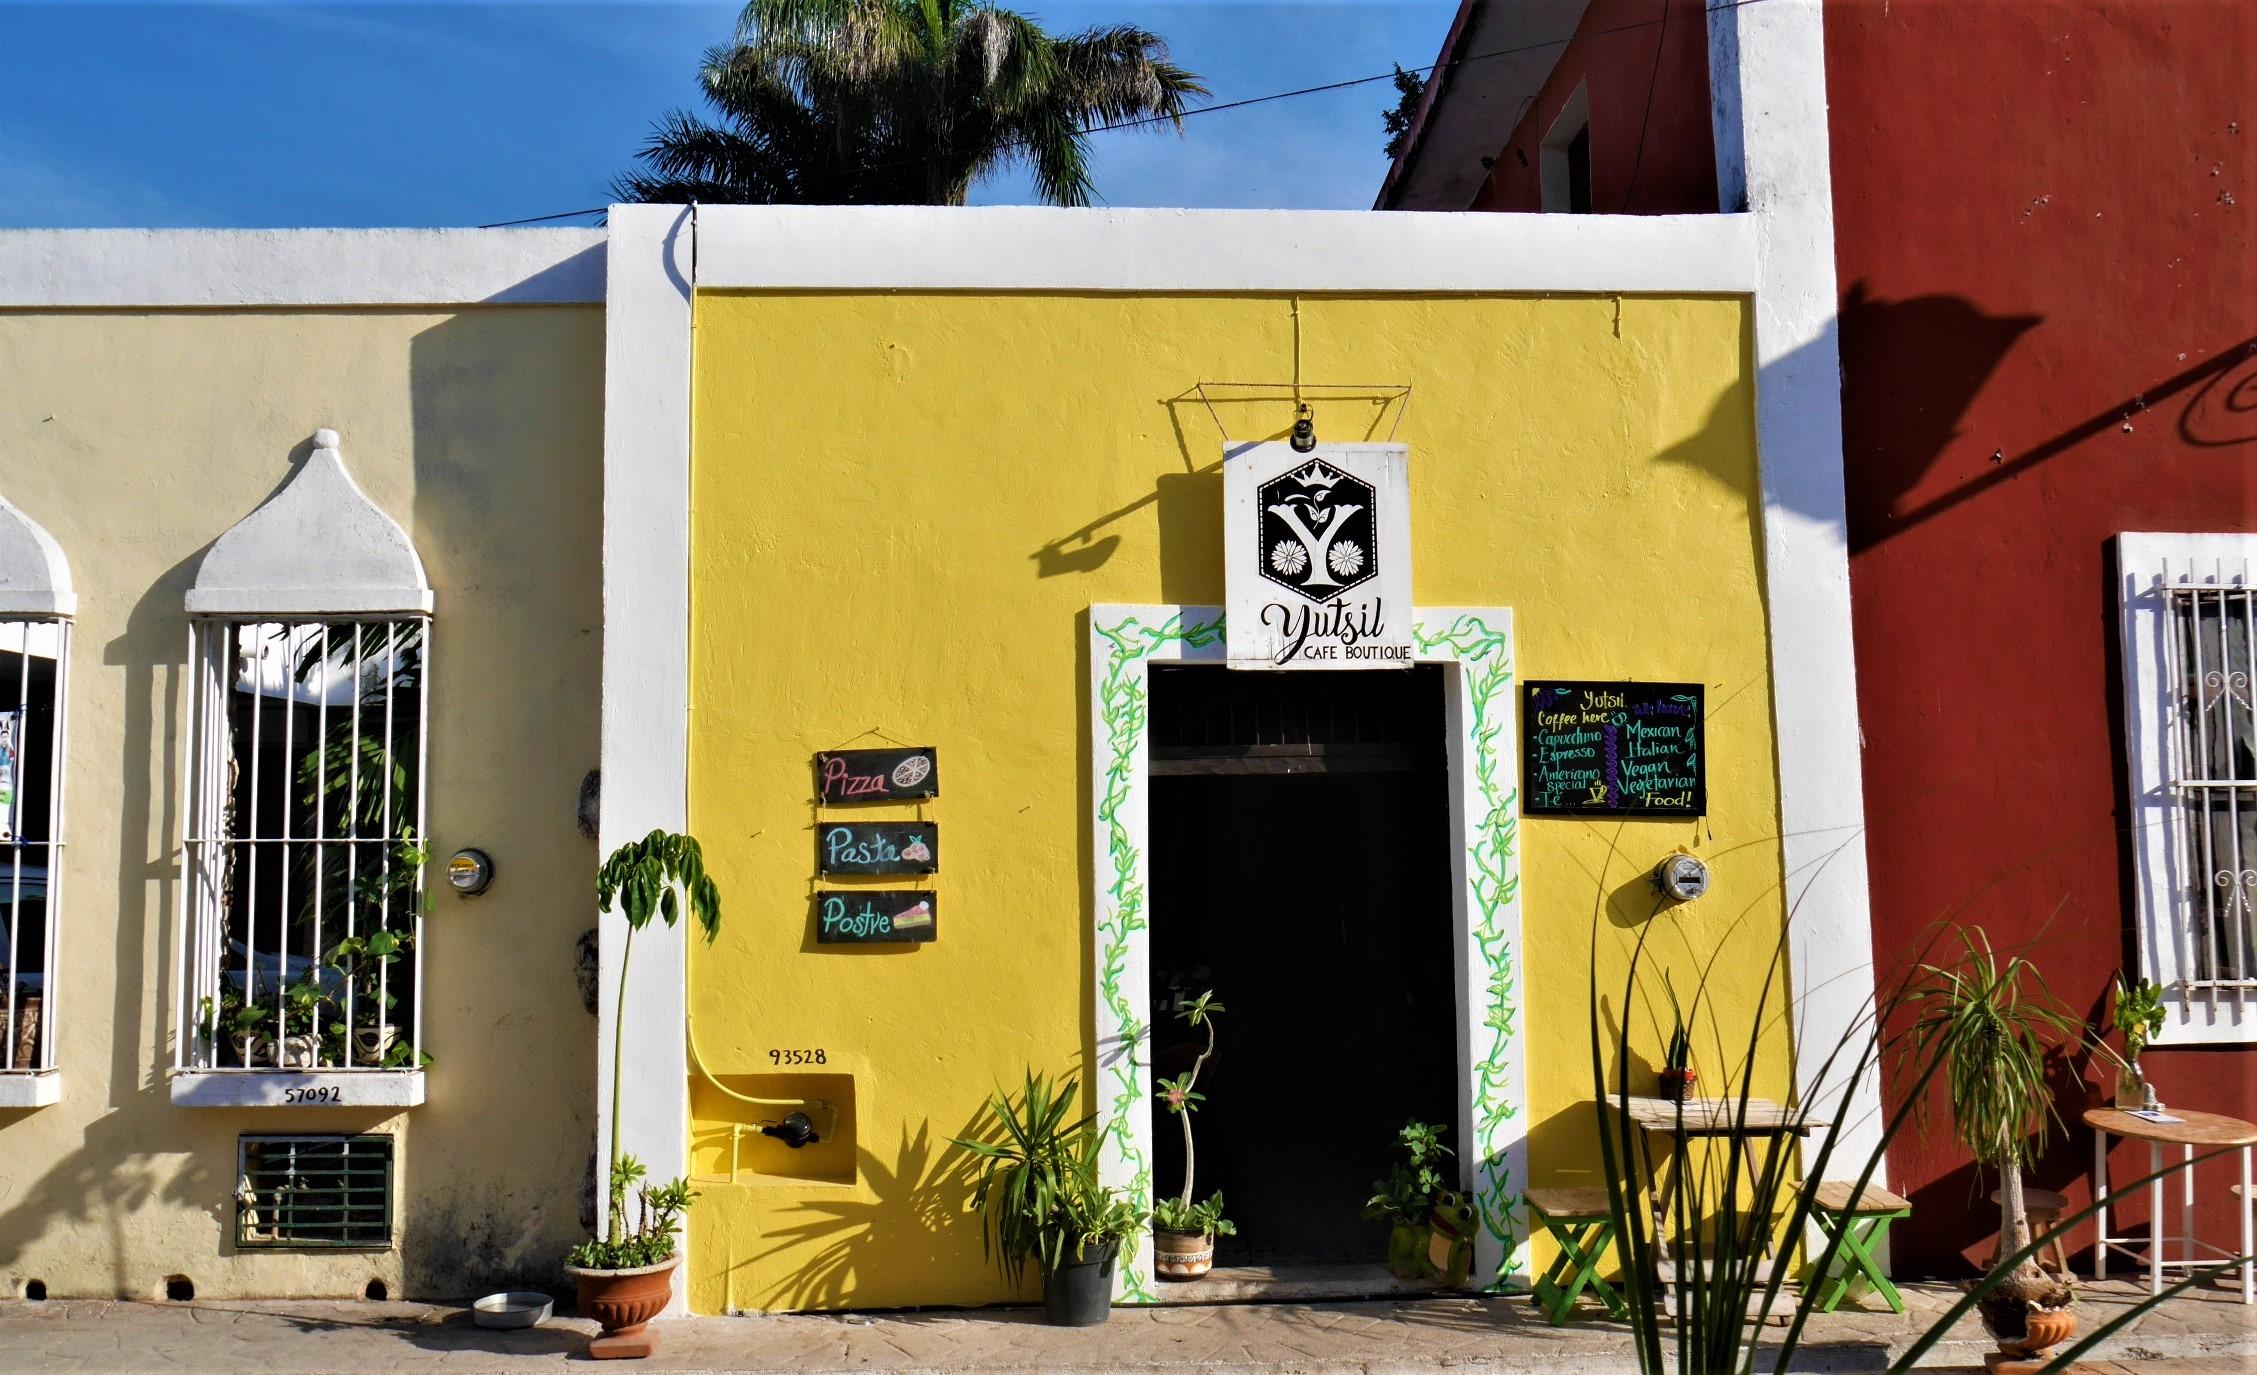 Valladolid calle 39 que faire souvenirs blog voyage yucatan mexique arpenter le chemin